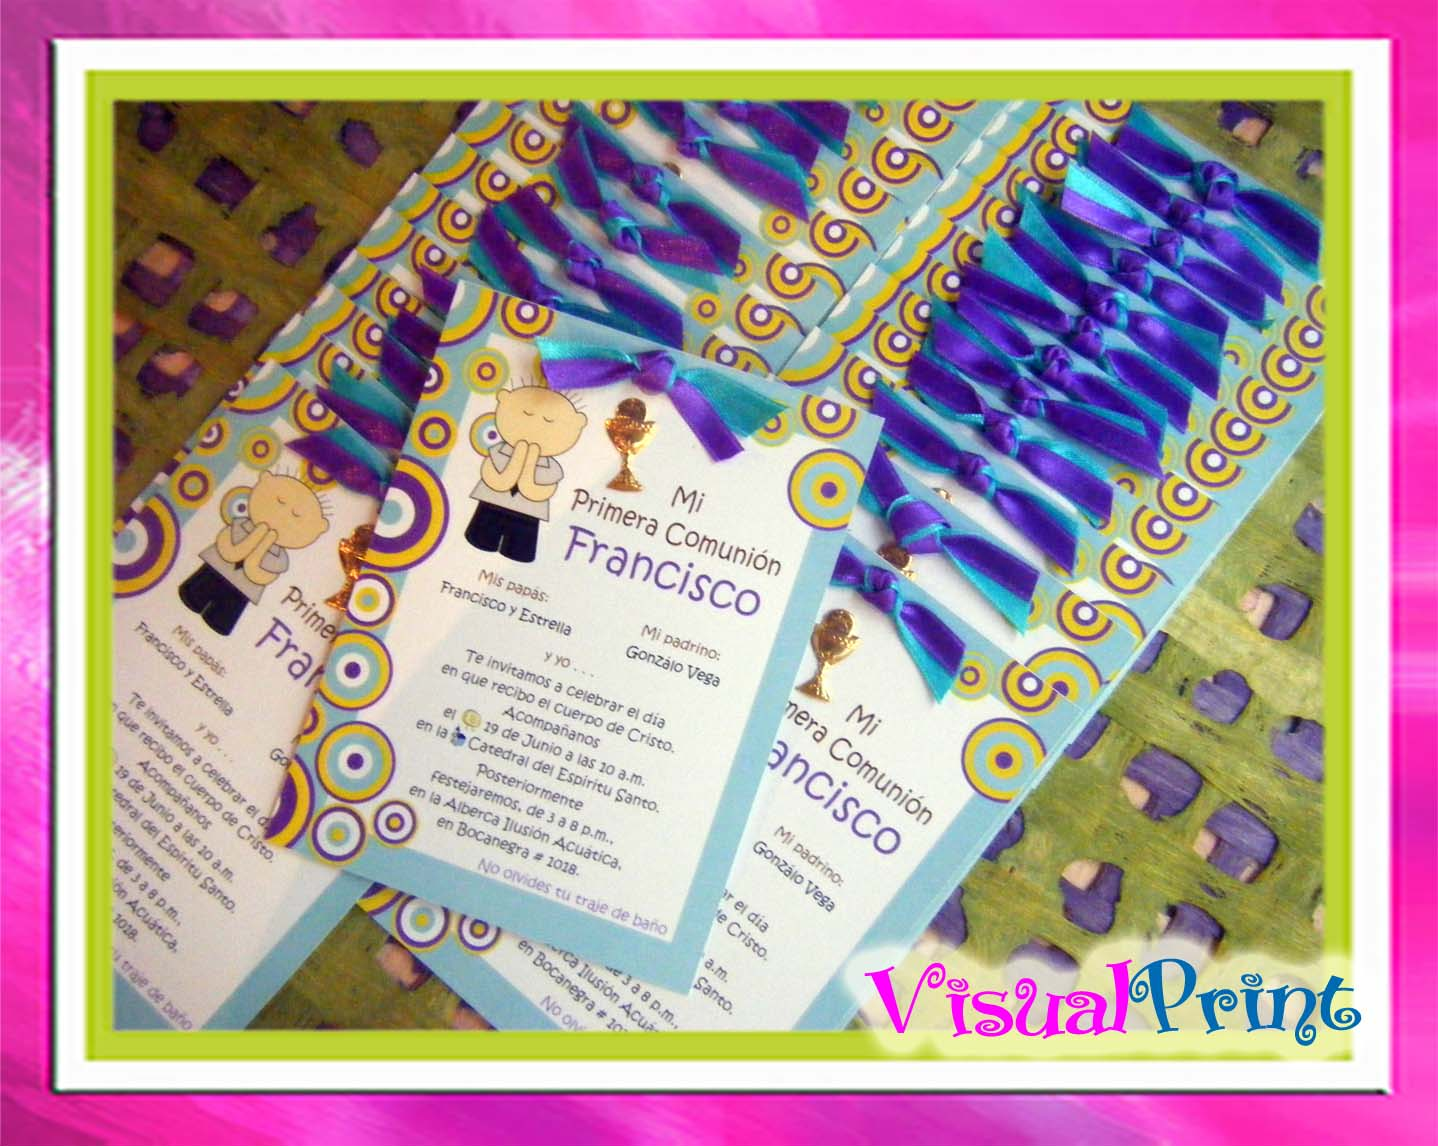 Invitaciones para primera comunion- La Belle Carte